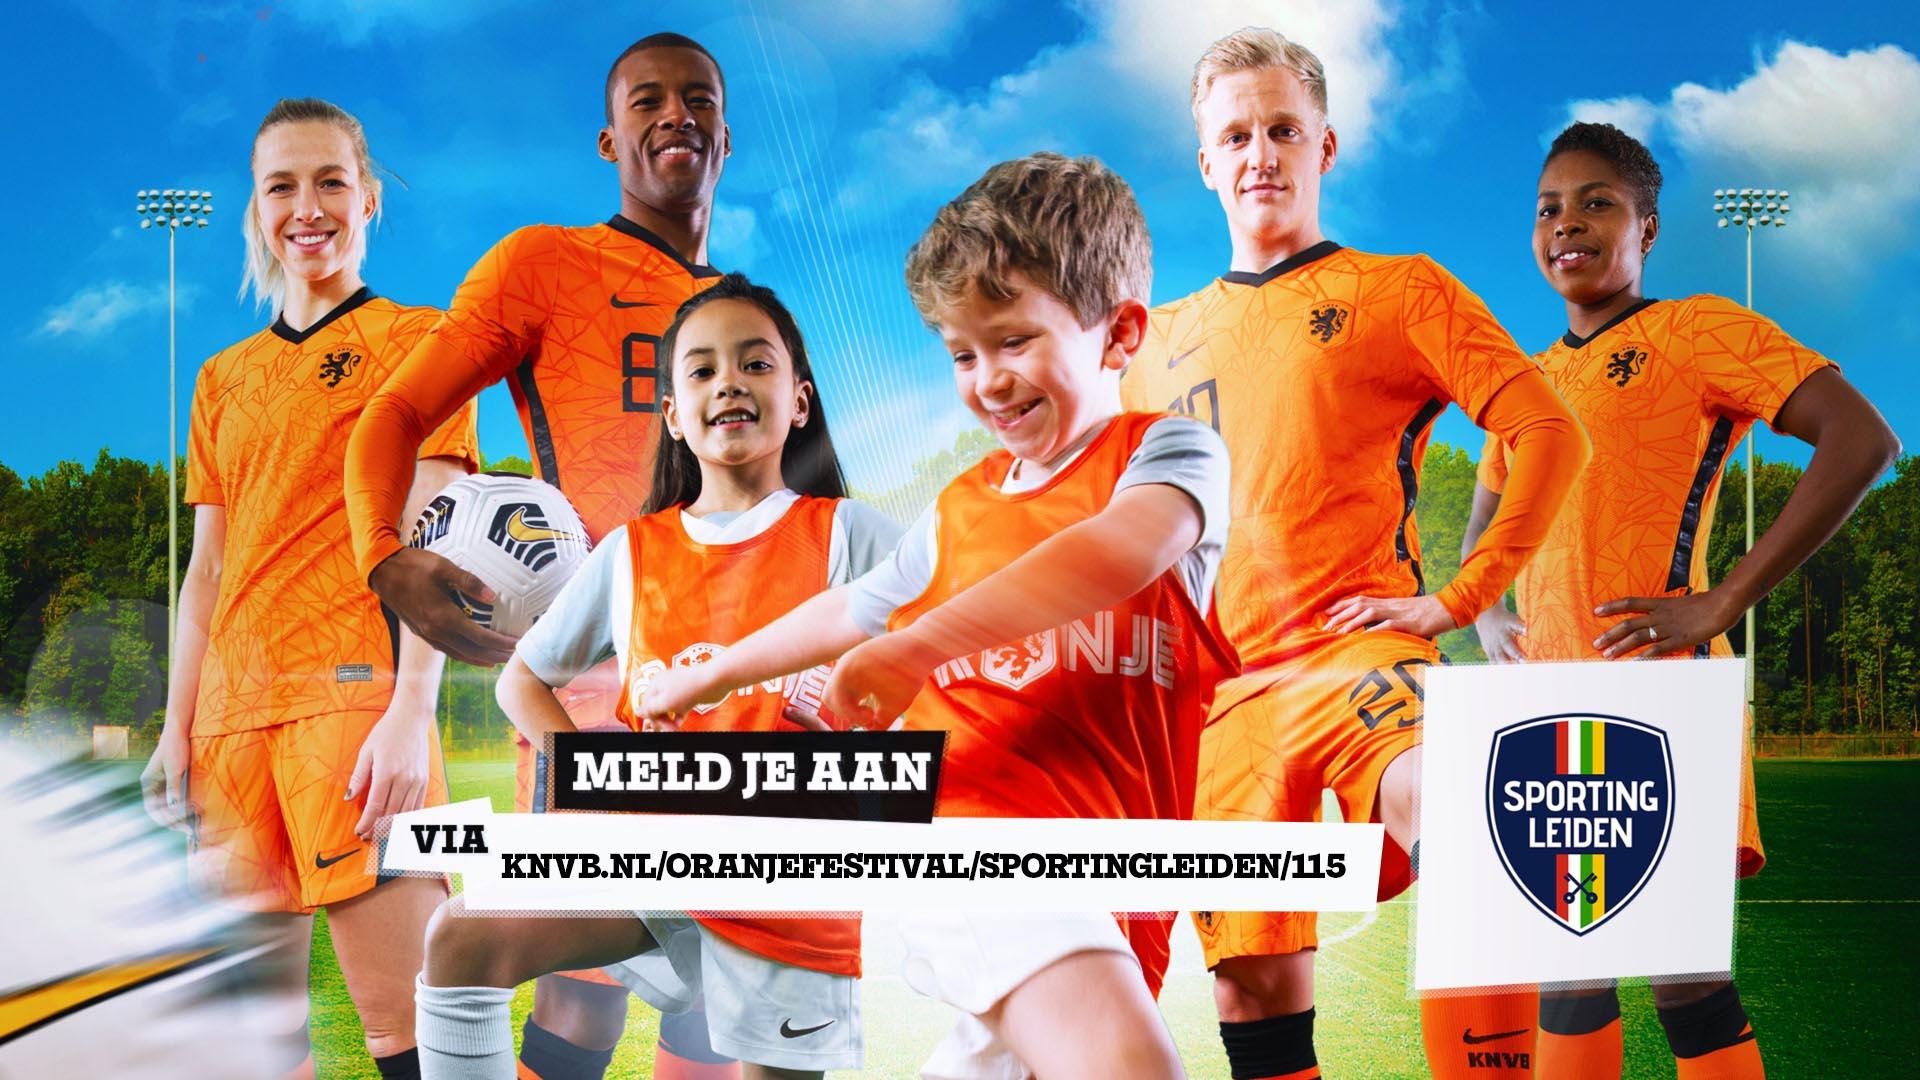 Oranjefestival Sporting Leiden